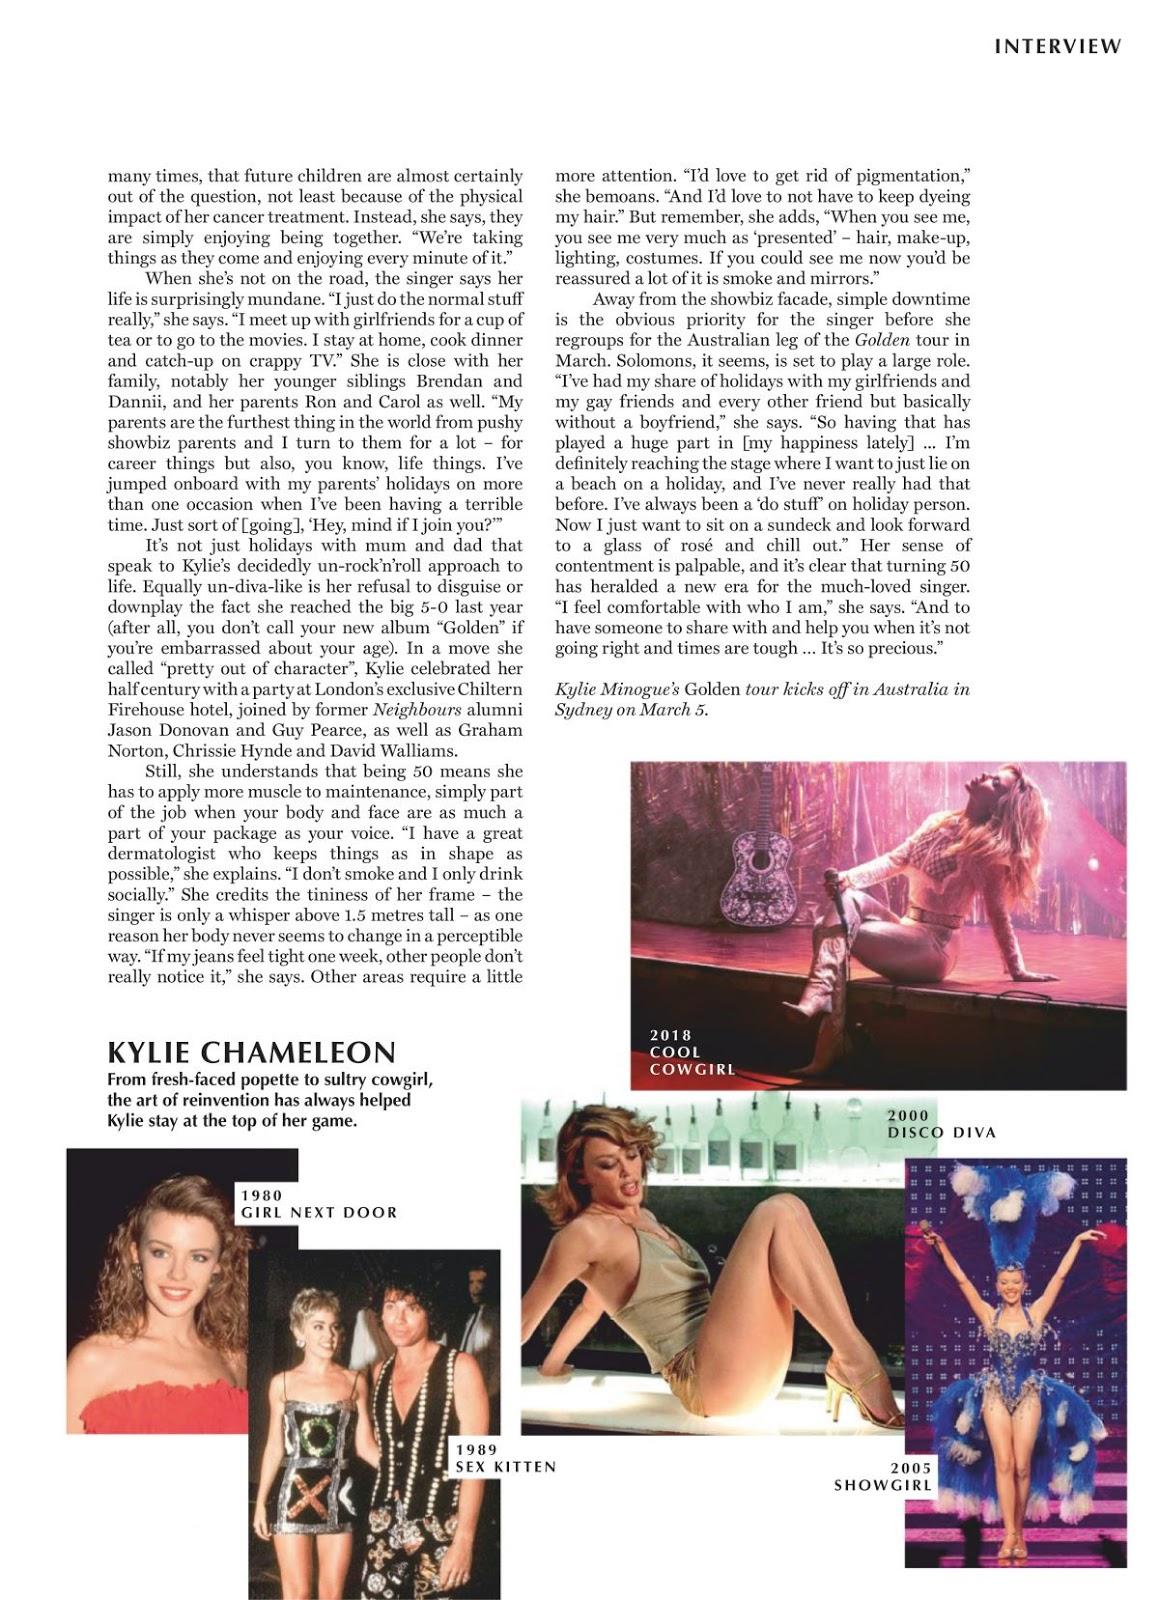 Kylie Minogue in Marie Claire Magazine, Australia March 2019